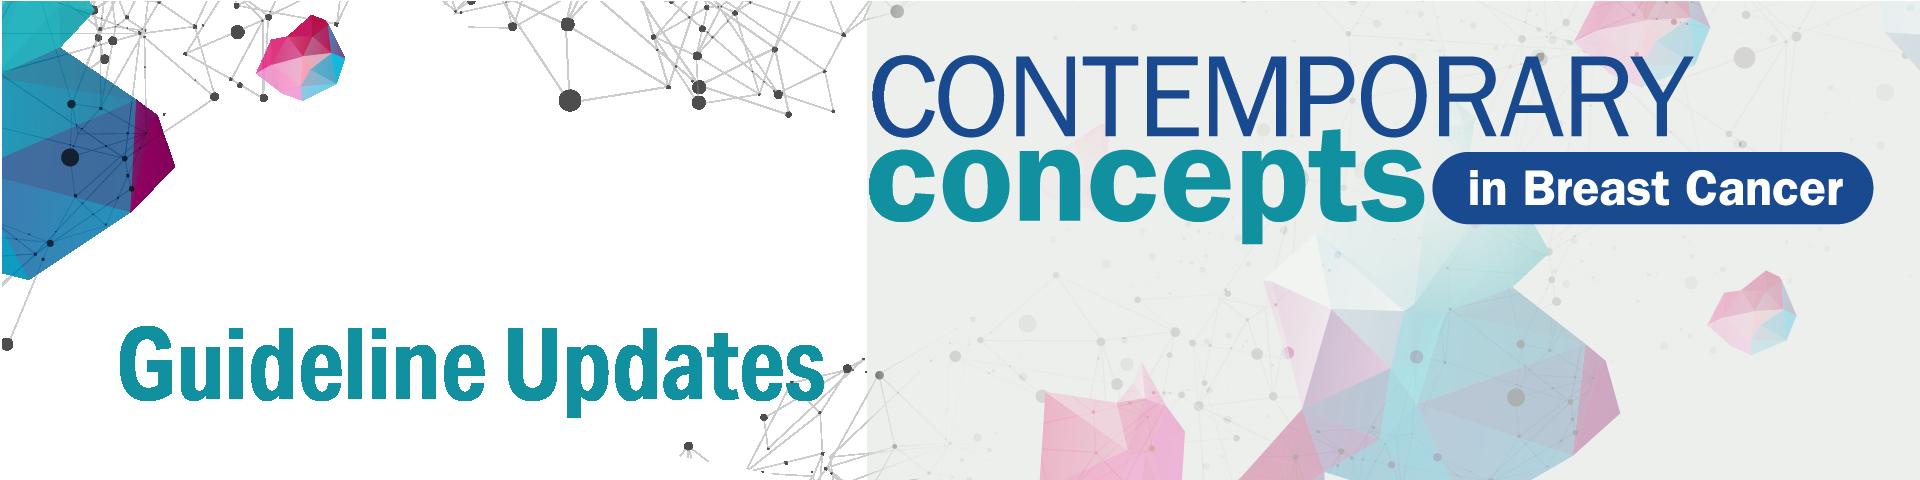 Contemporary Concepts   Contemporary Concepts in Breast Cancer   <b>Guideline Updates</b>